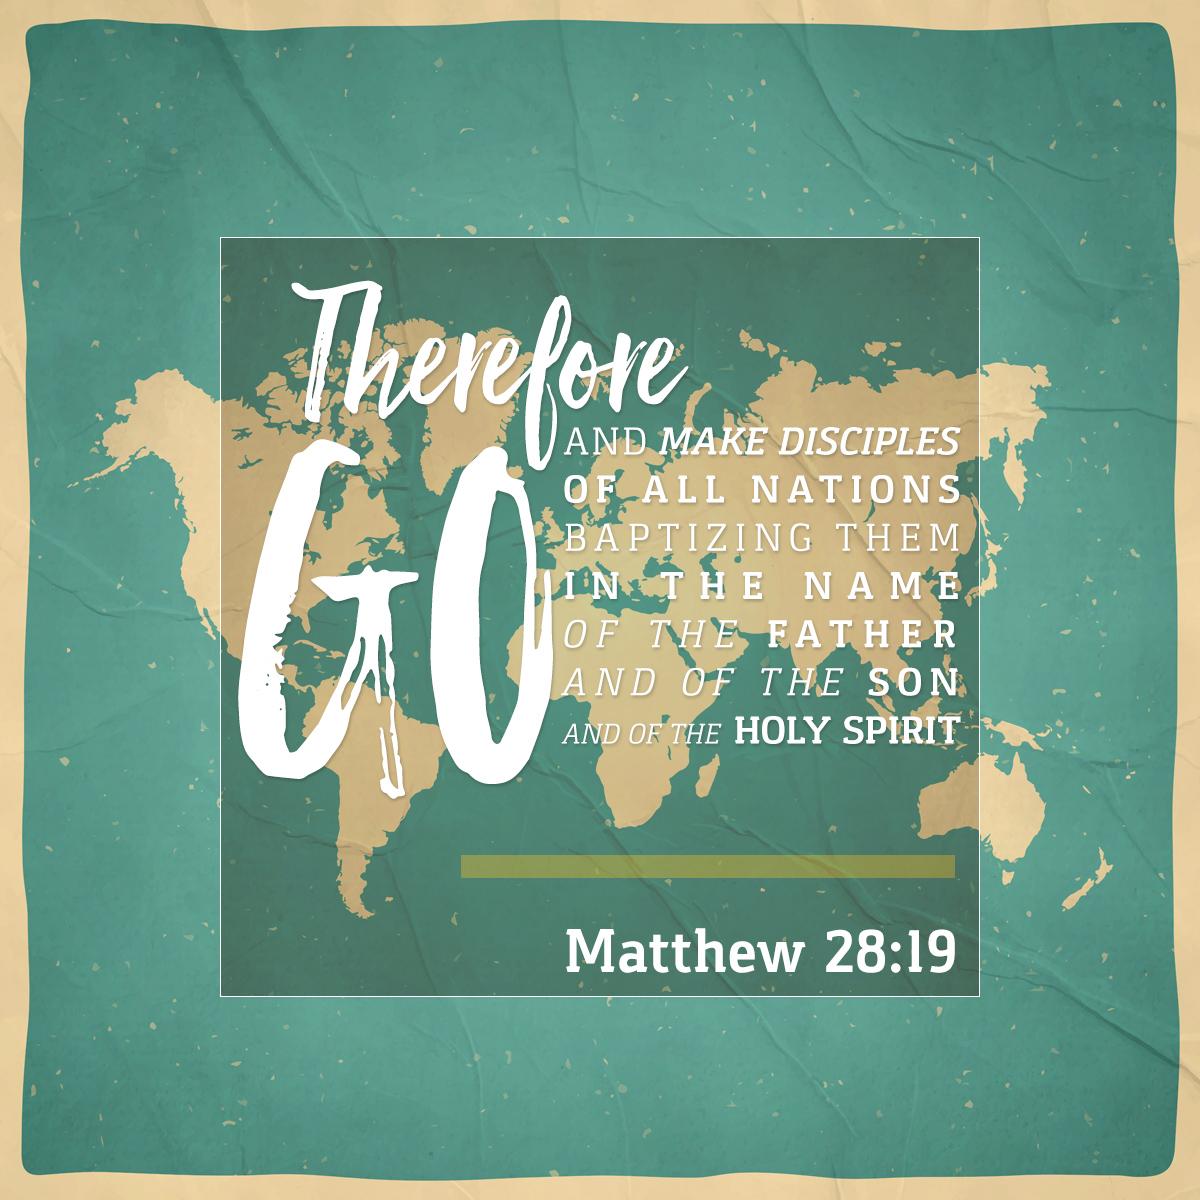 Matthew 28:19 - Daily Verse